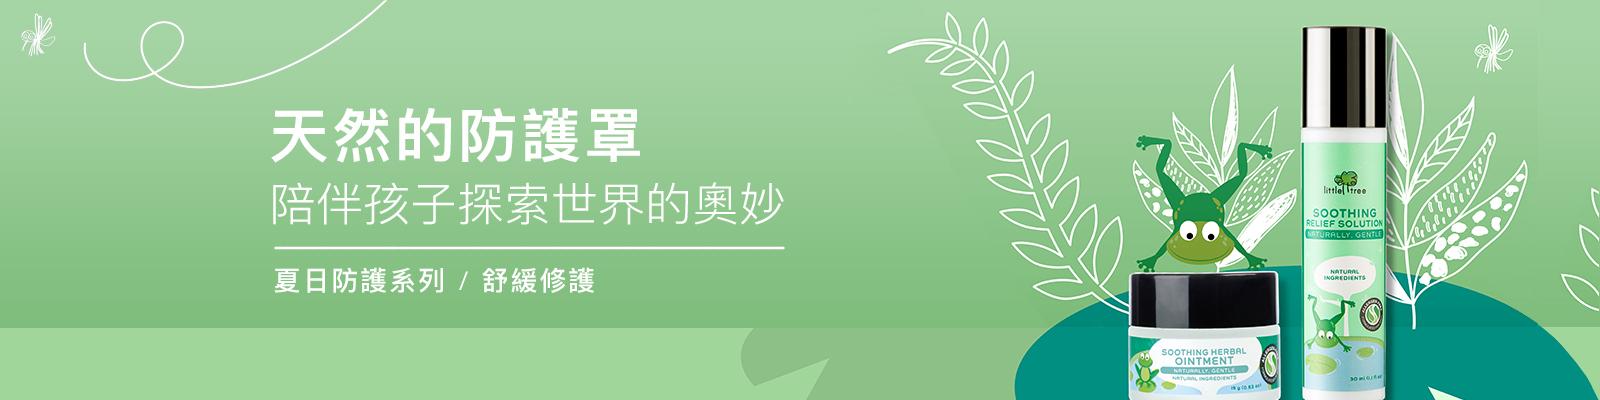 Desktop Banner for Jual Rangkaian Lotion Anti Nyamuk Bayi Little Tree Murah